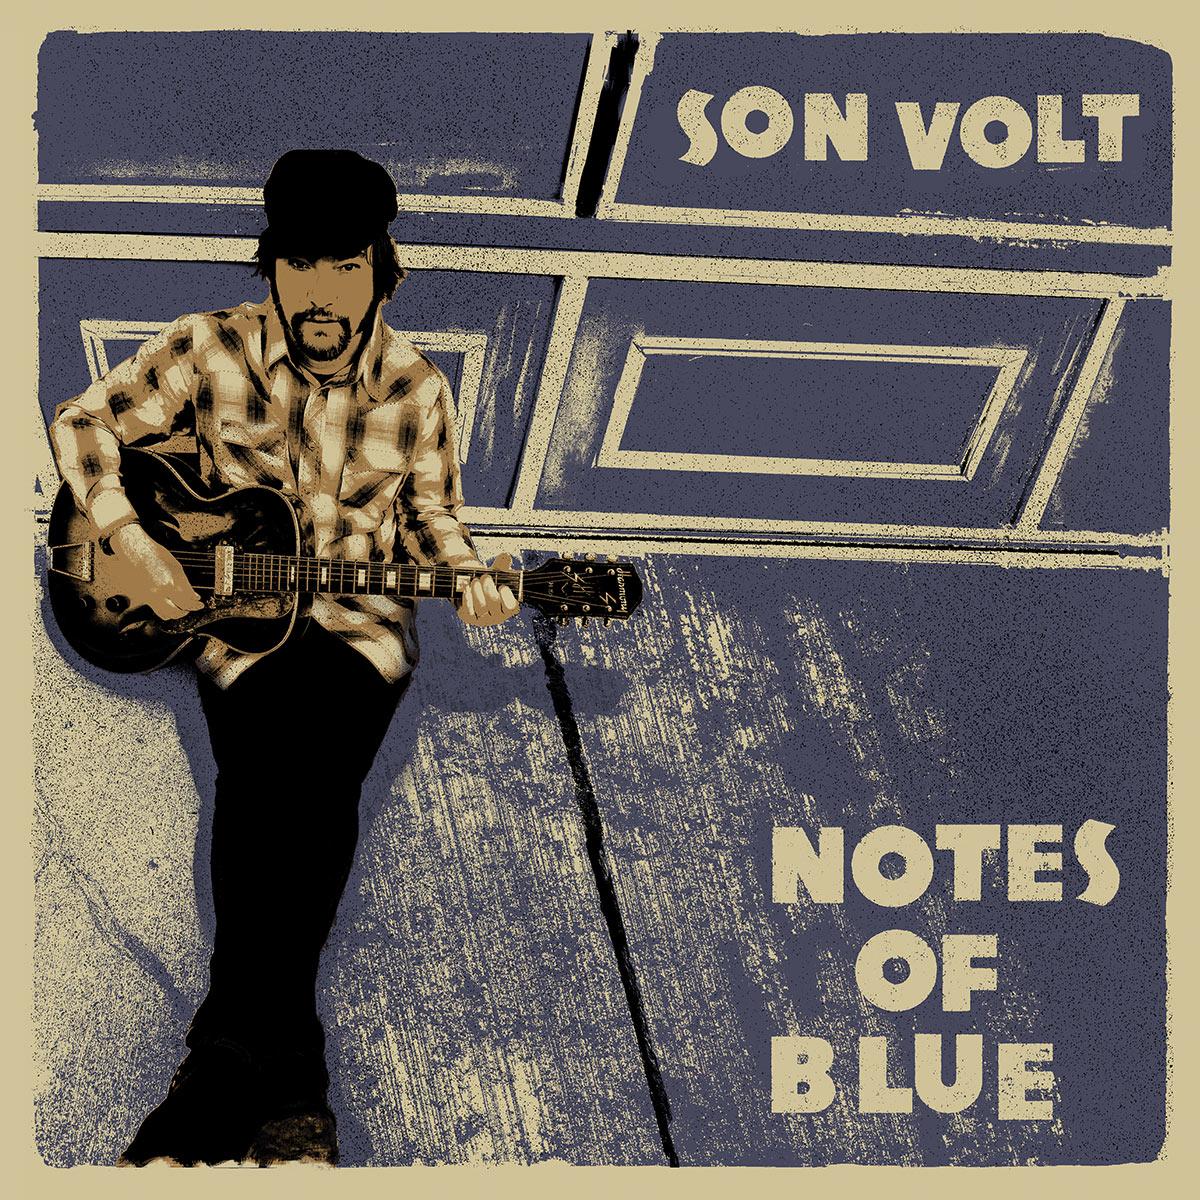 sonvolt-notes-of-blue